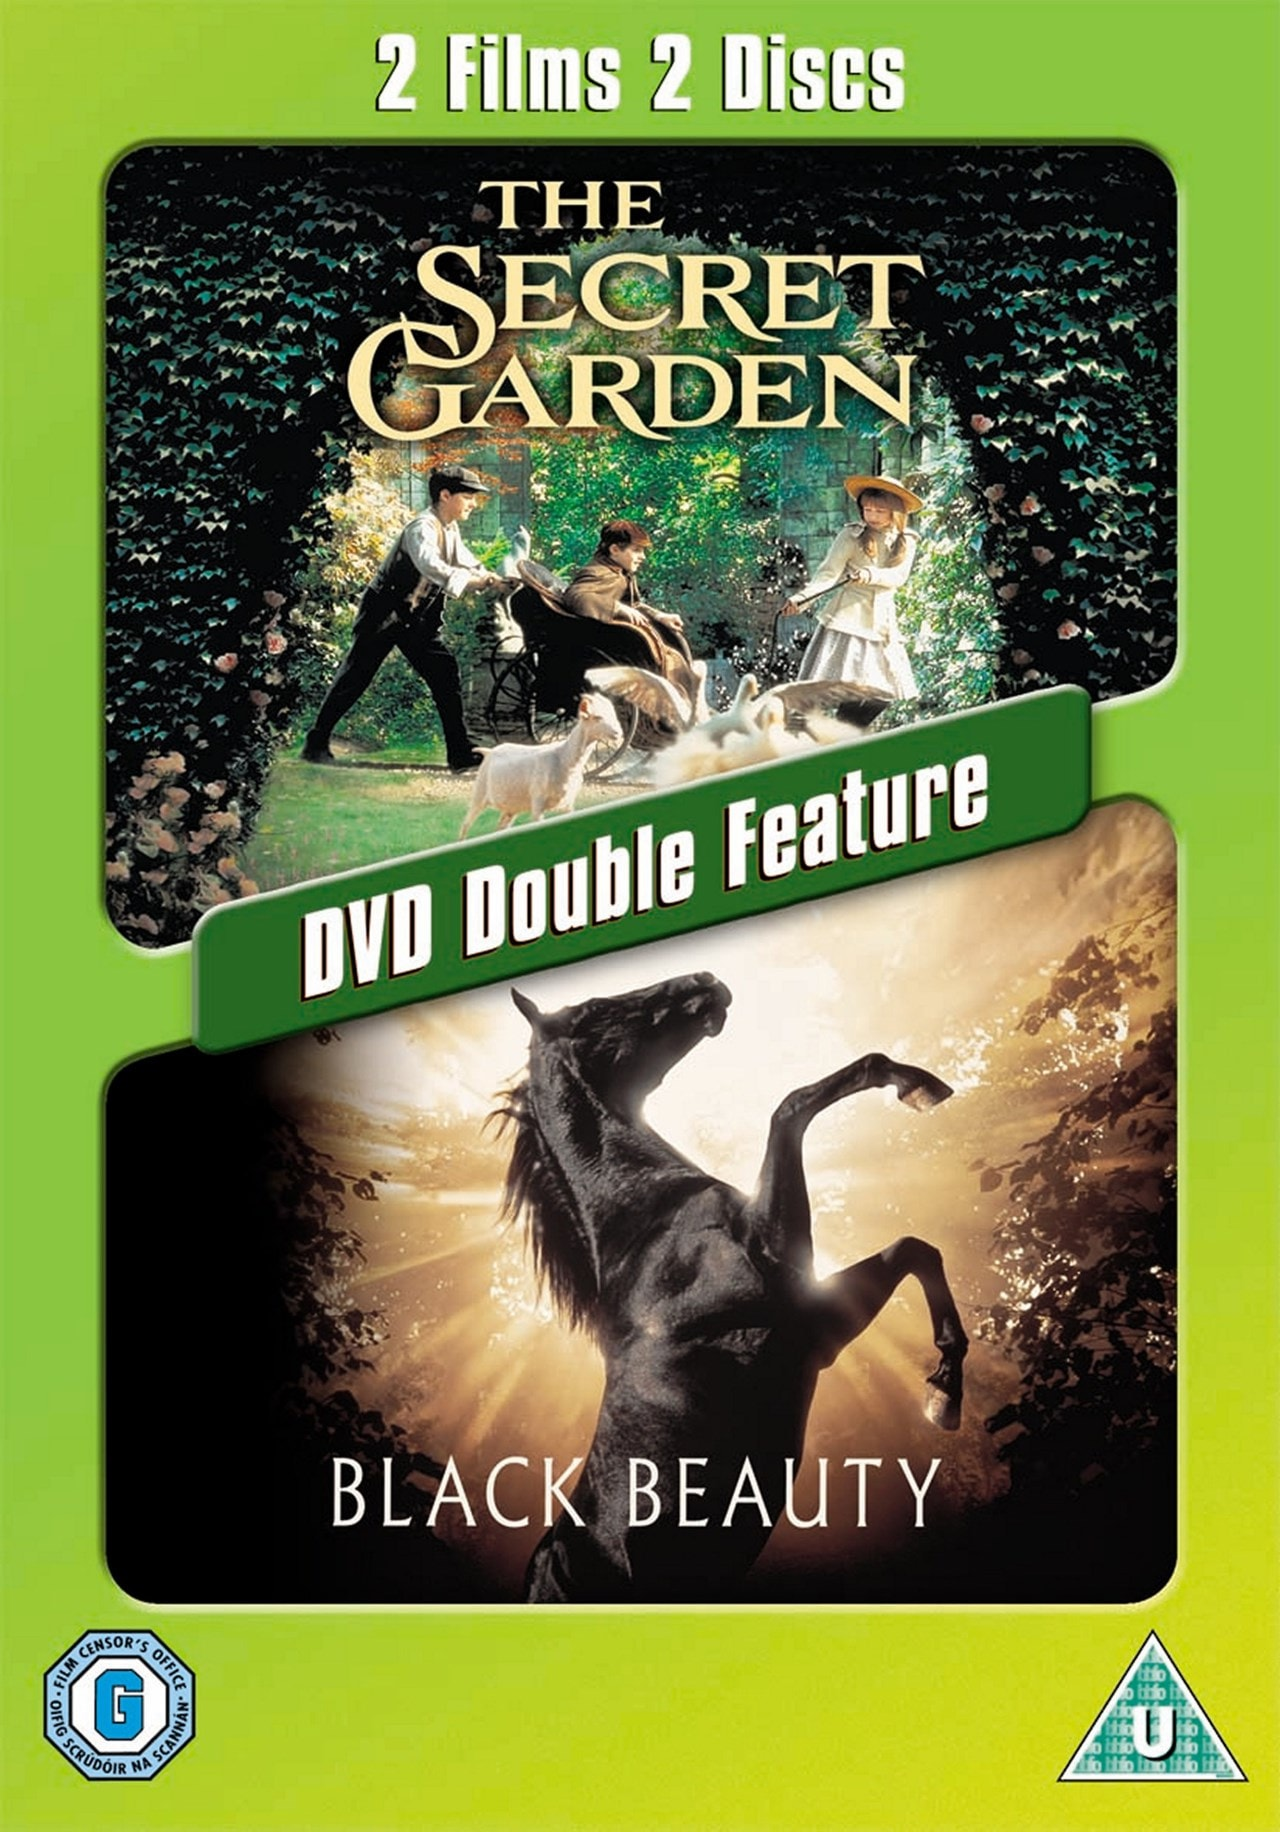 The Secret Garden/Black Beauty - 1